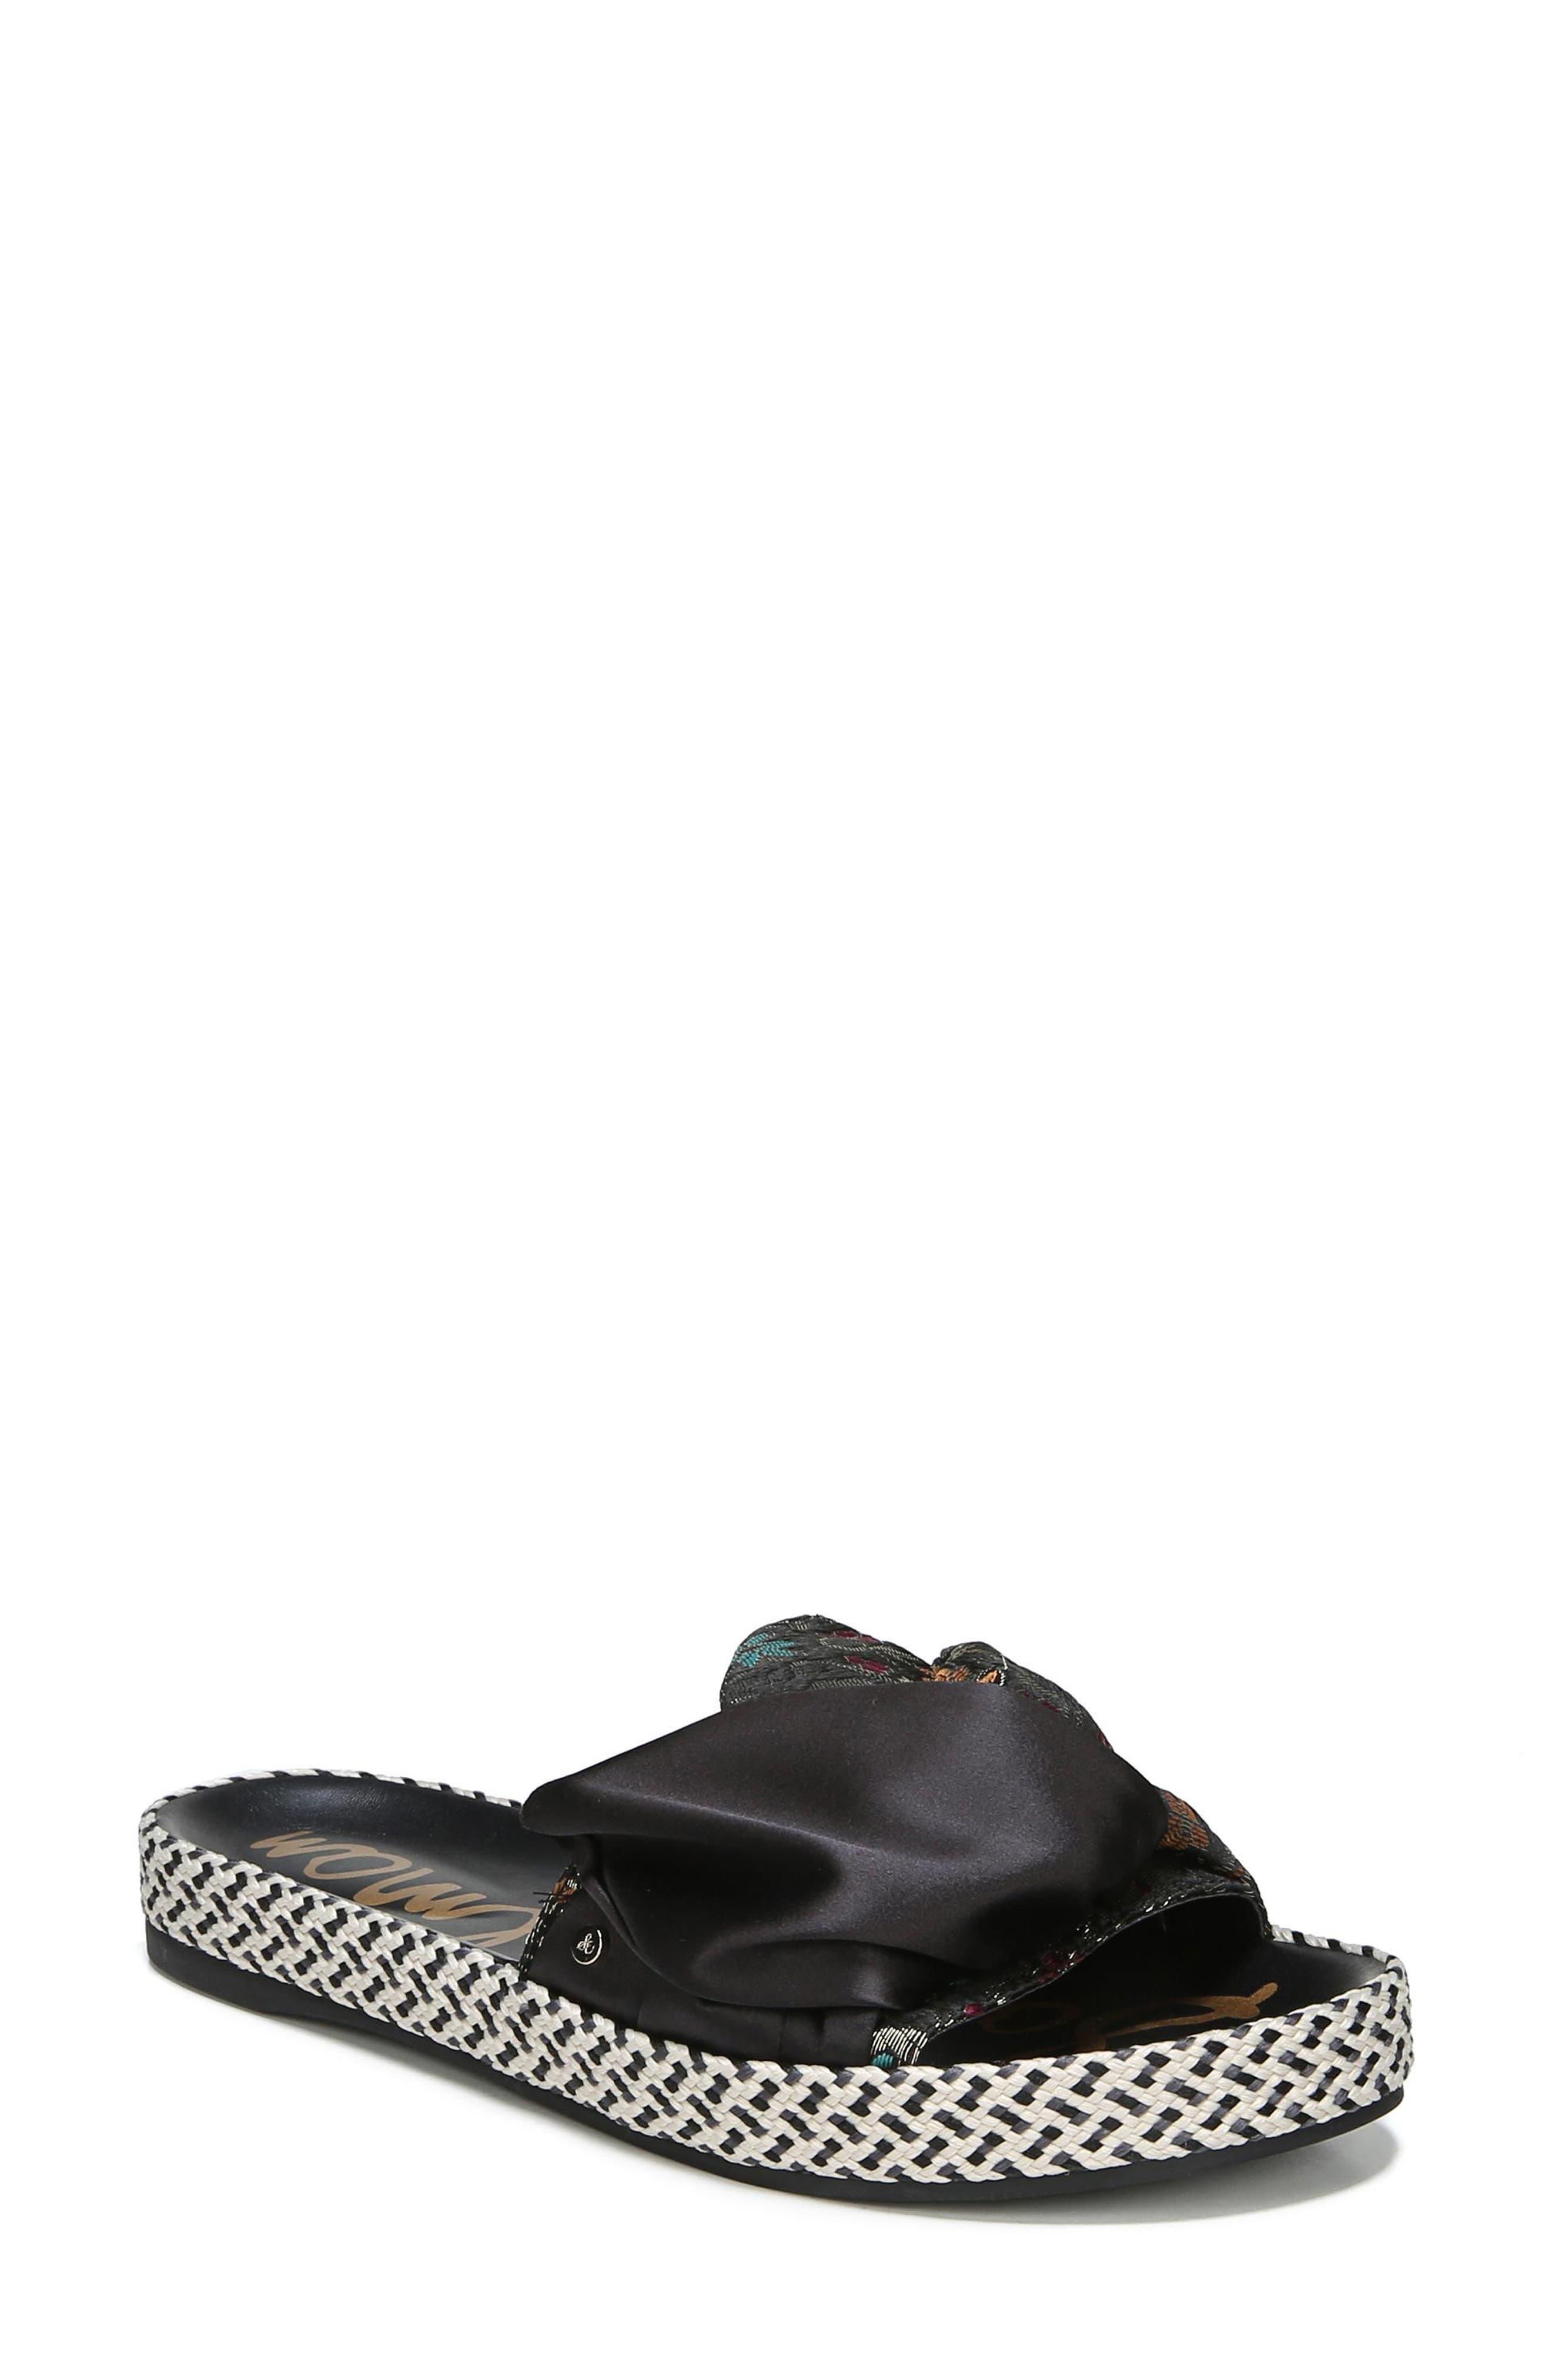 Bodie Slide Sandal,                             Main thumbnail 1, color,                             Black Floral Brocade